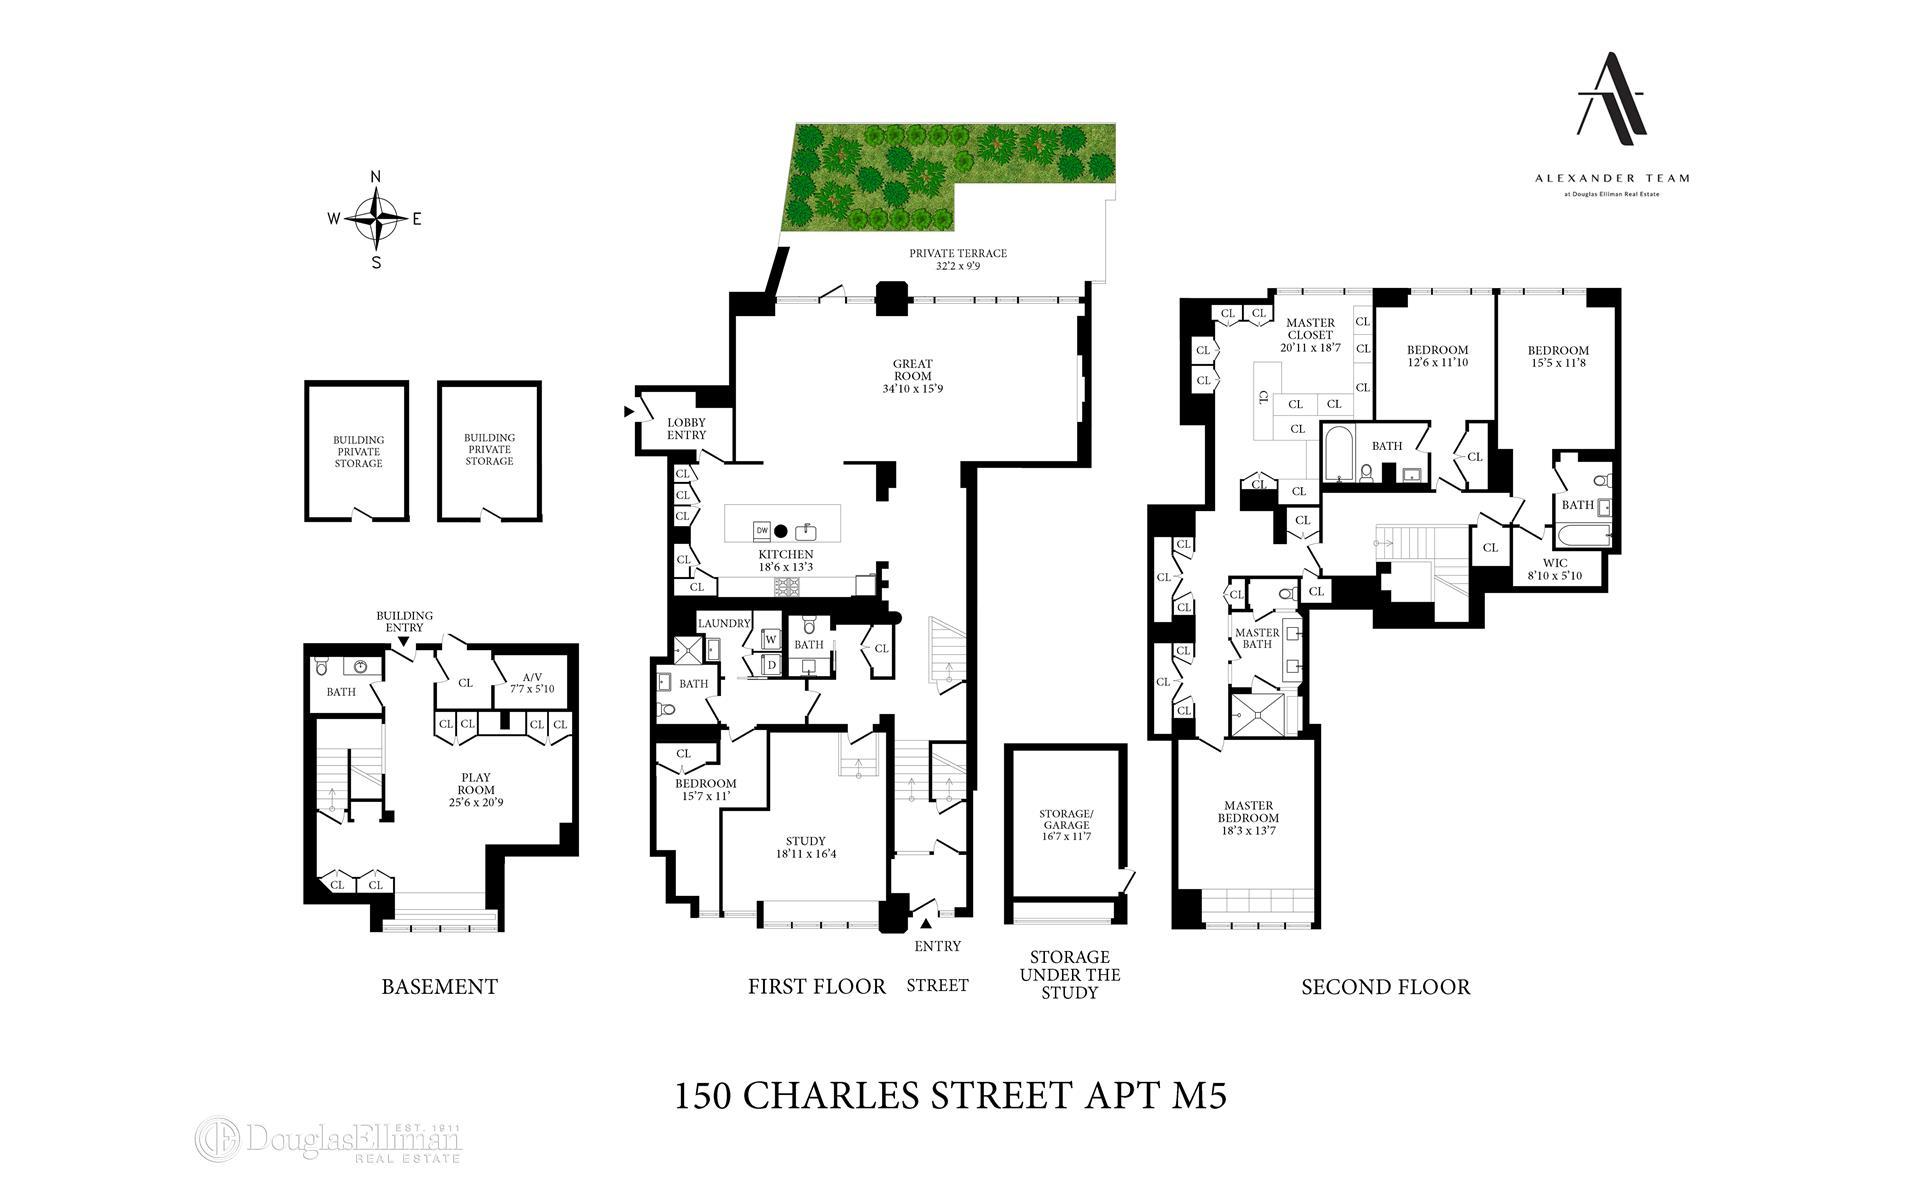 150 Charles Street Interior Photo